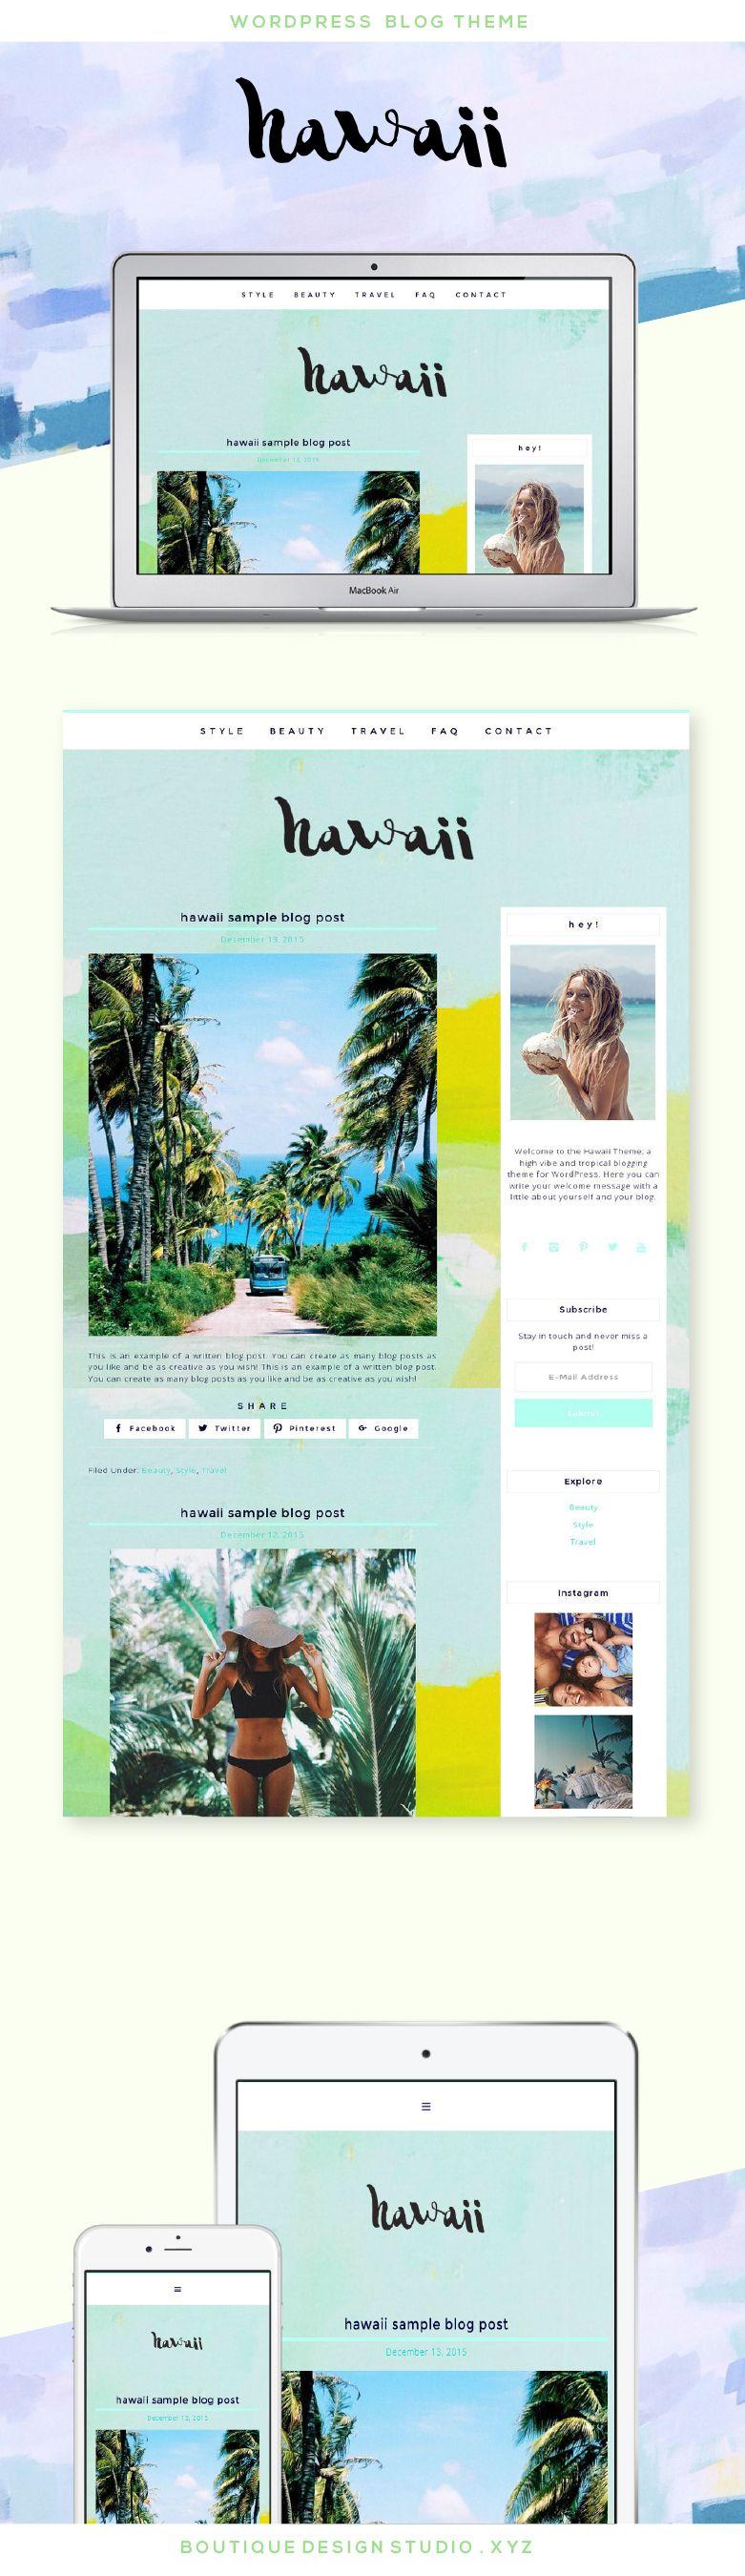 Hawaii Wordpress Theme Boutique Web Design Studio Blog Themes Wordpress Blog Design Wordpress Theme Wordpress Blog Design